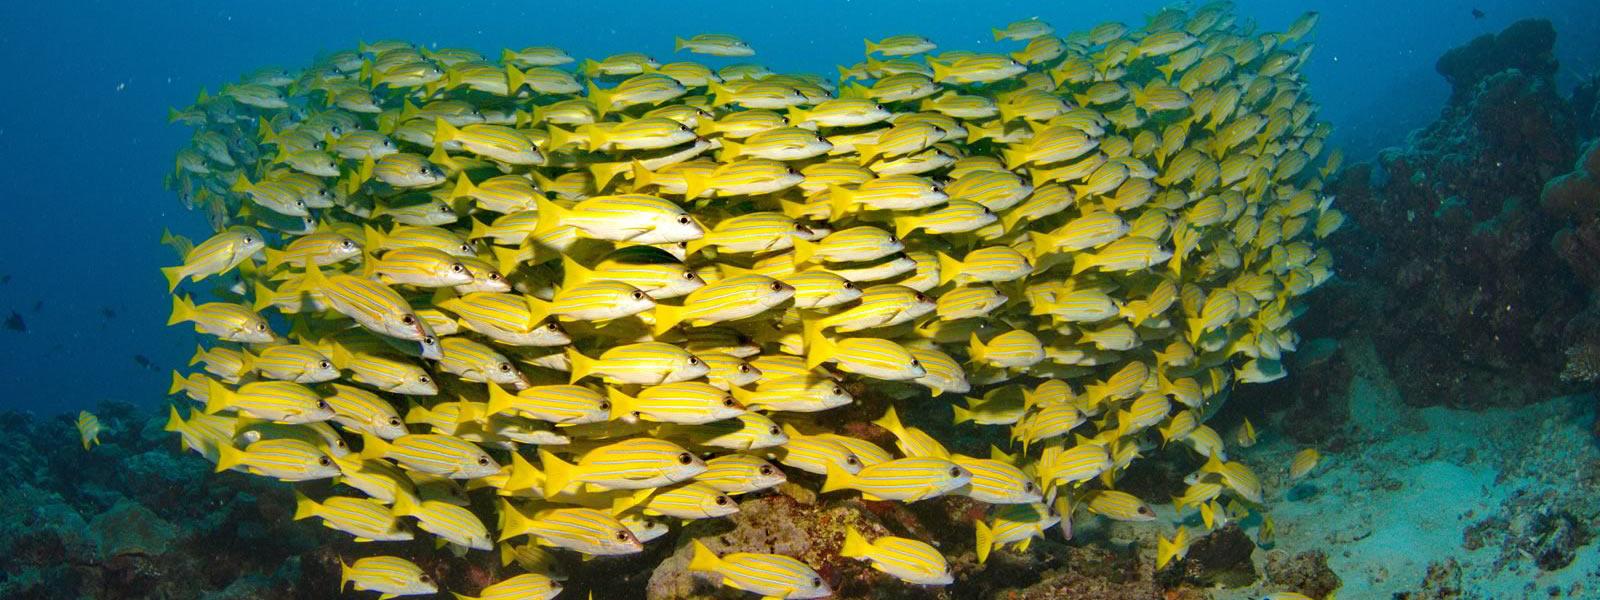 Maldives Scuba Diving